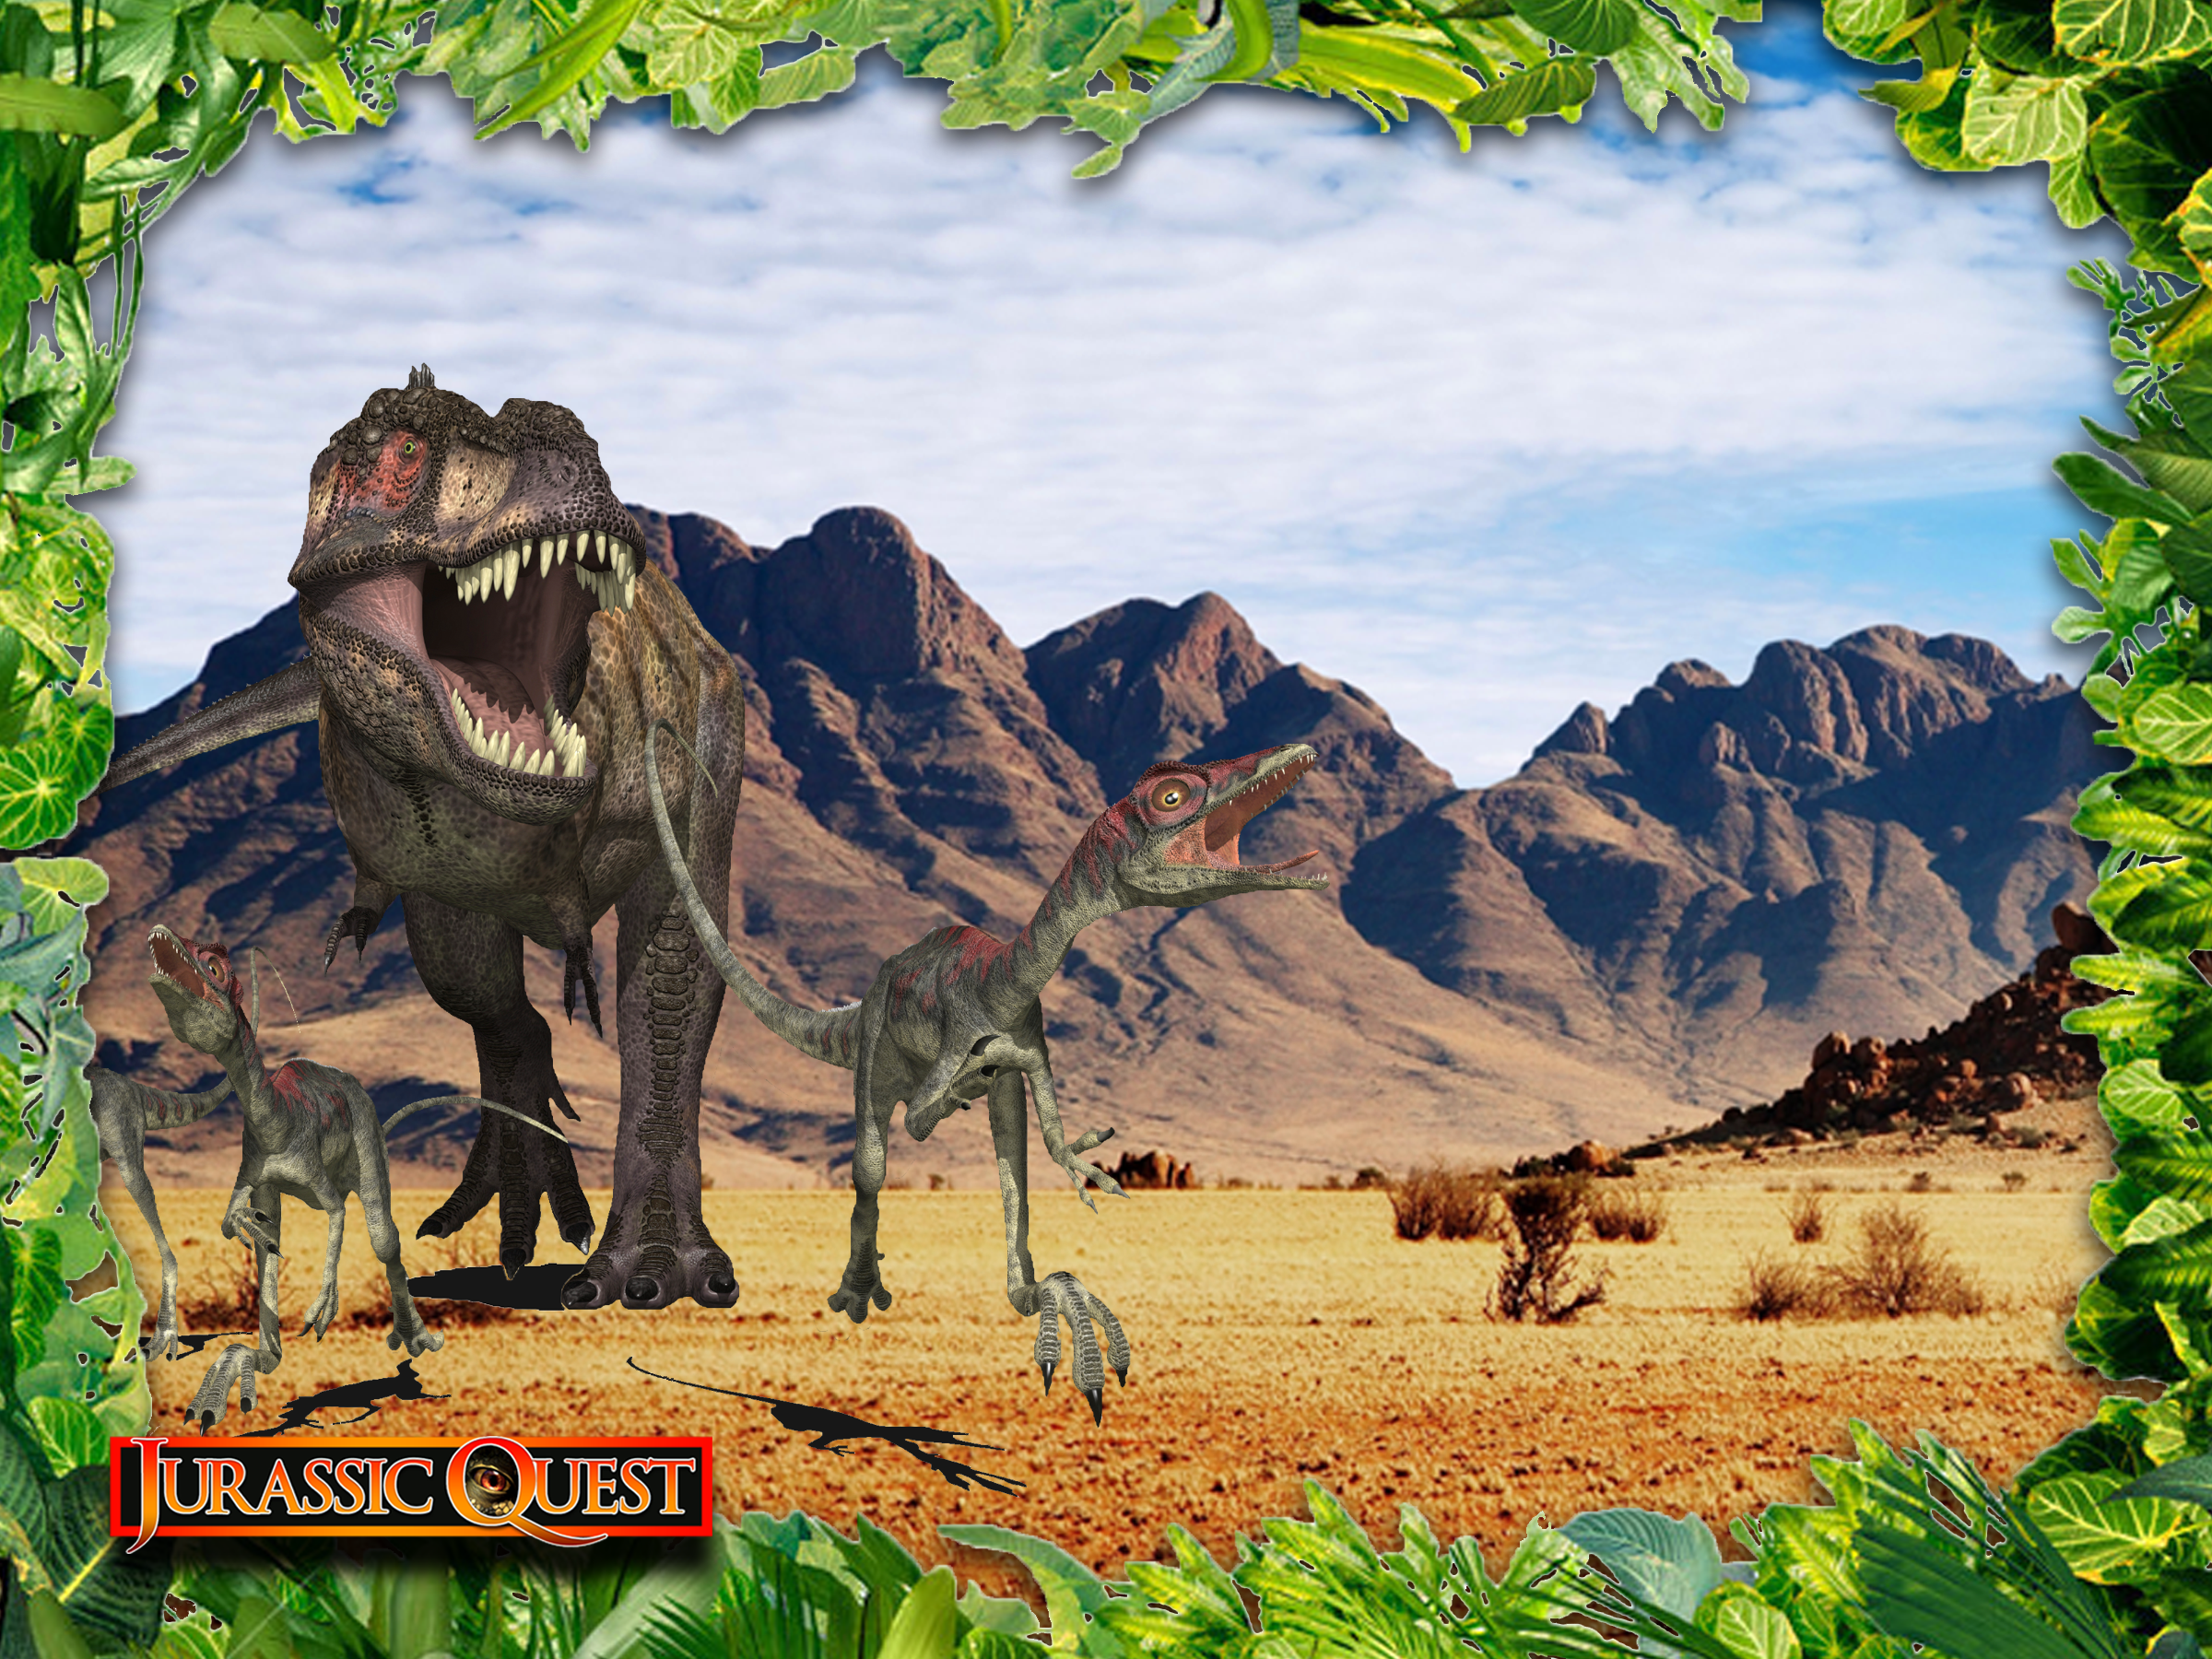 Jurassic Quest at Iowa Events Center